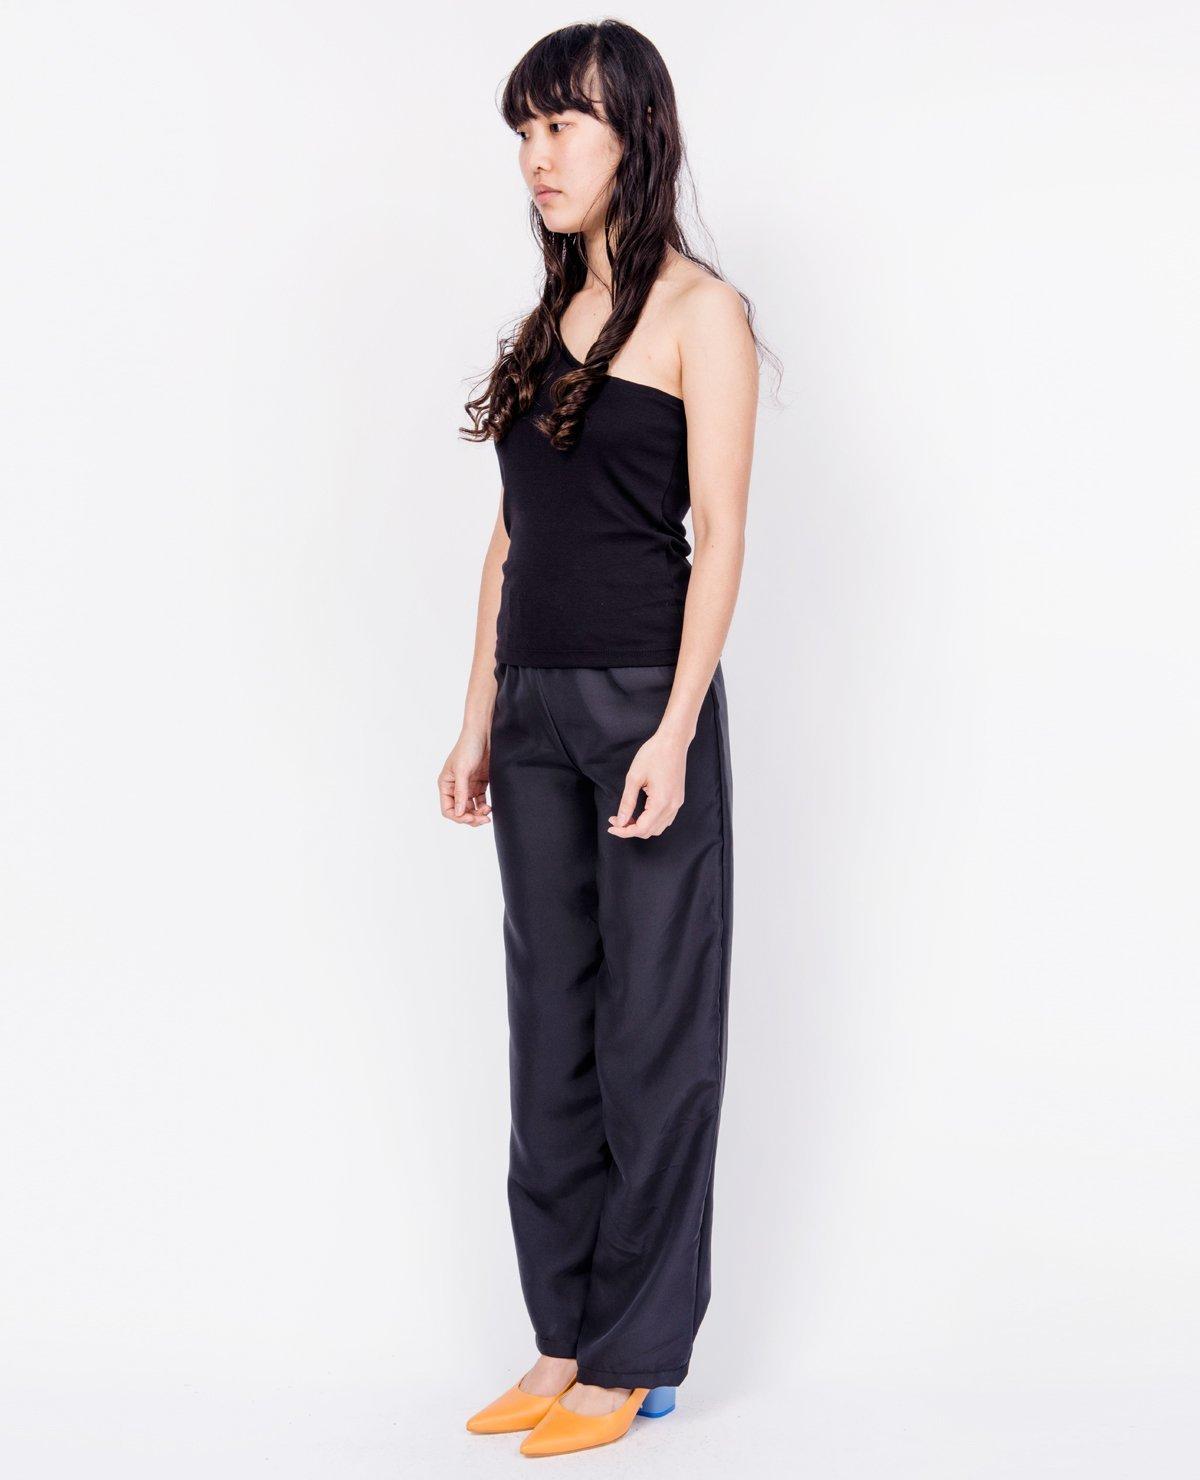 46dc18b7b0c BY SIGNE One Shoulder Top - Black | Garmentory